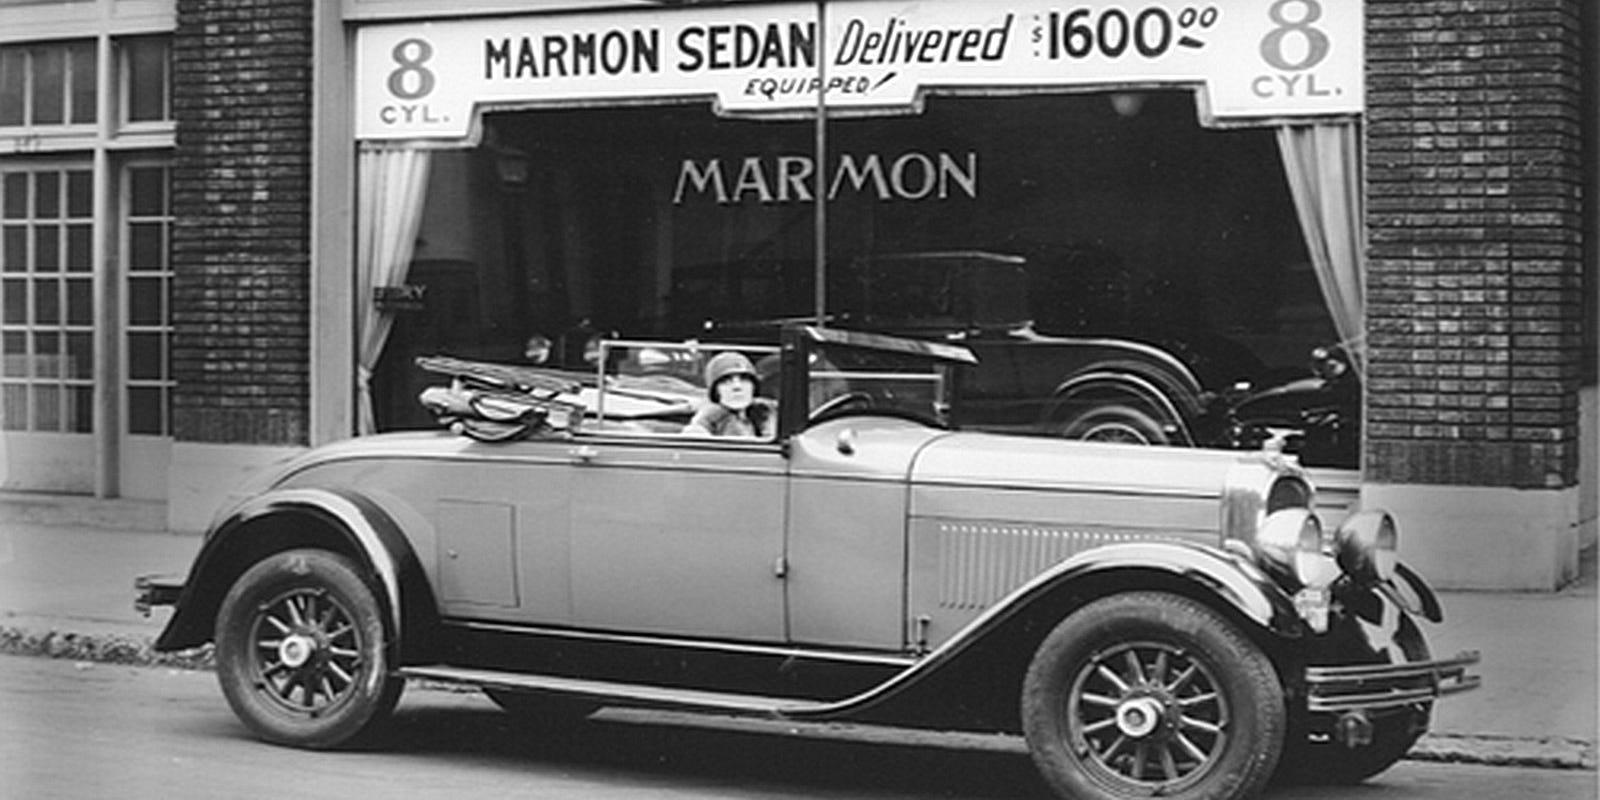 Get the skinny on legendary Faatz family's 1920s auto days